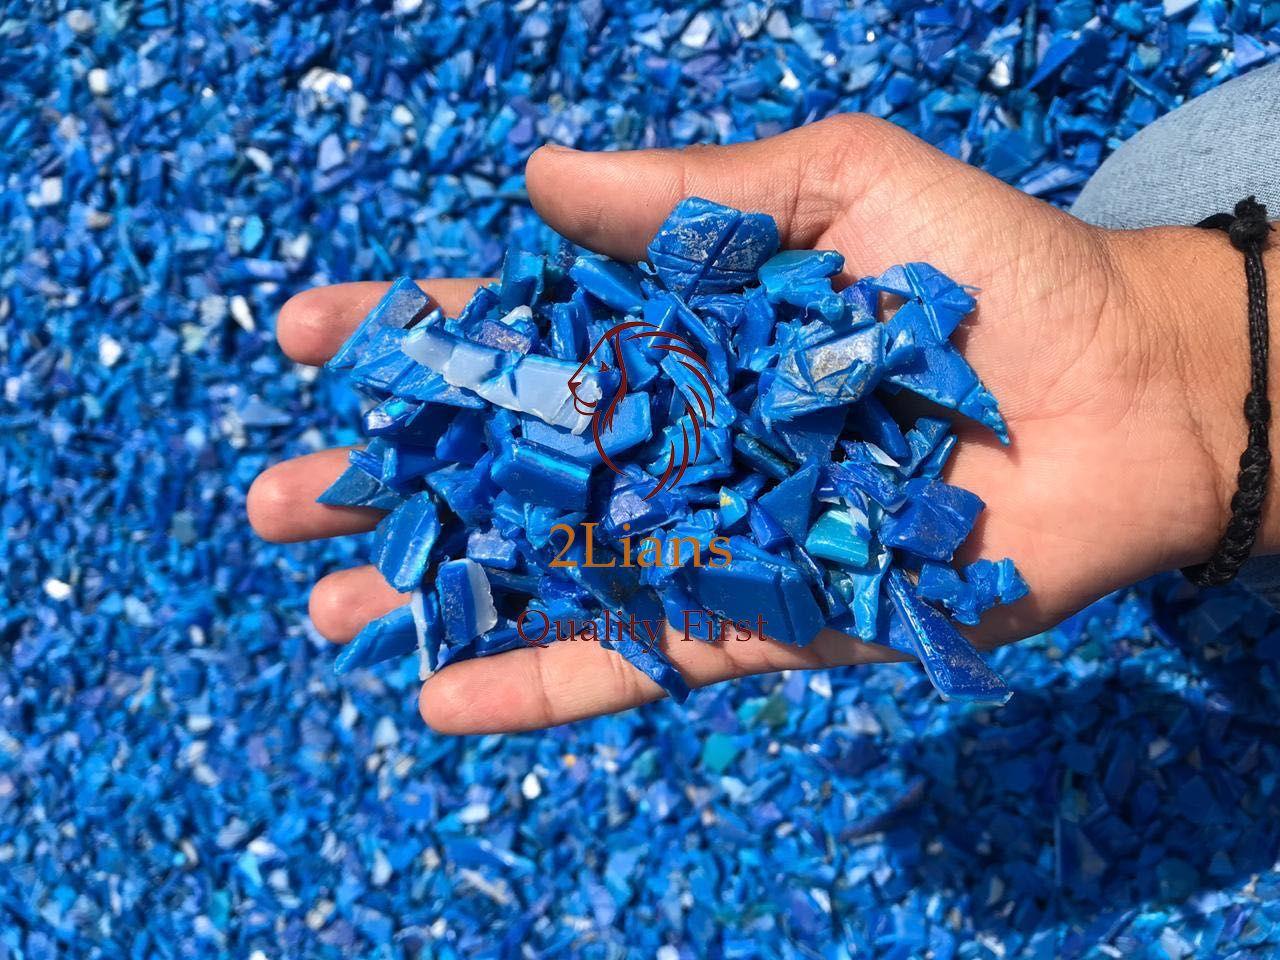 HDPE Drum Regrind Plastik Bekas/HDPE Biru Regrind Alami Limbah Industri Botol atau Kemasan